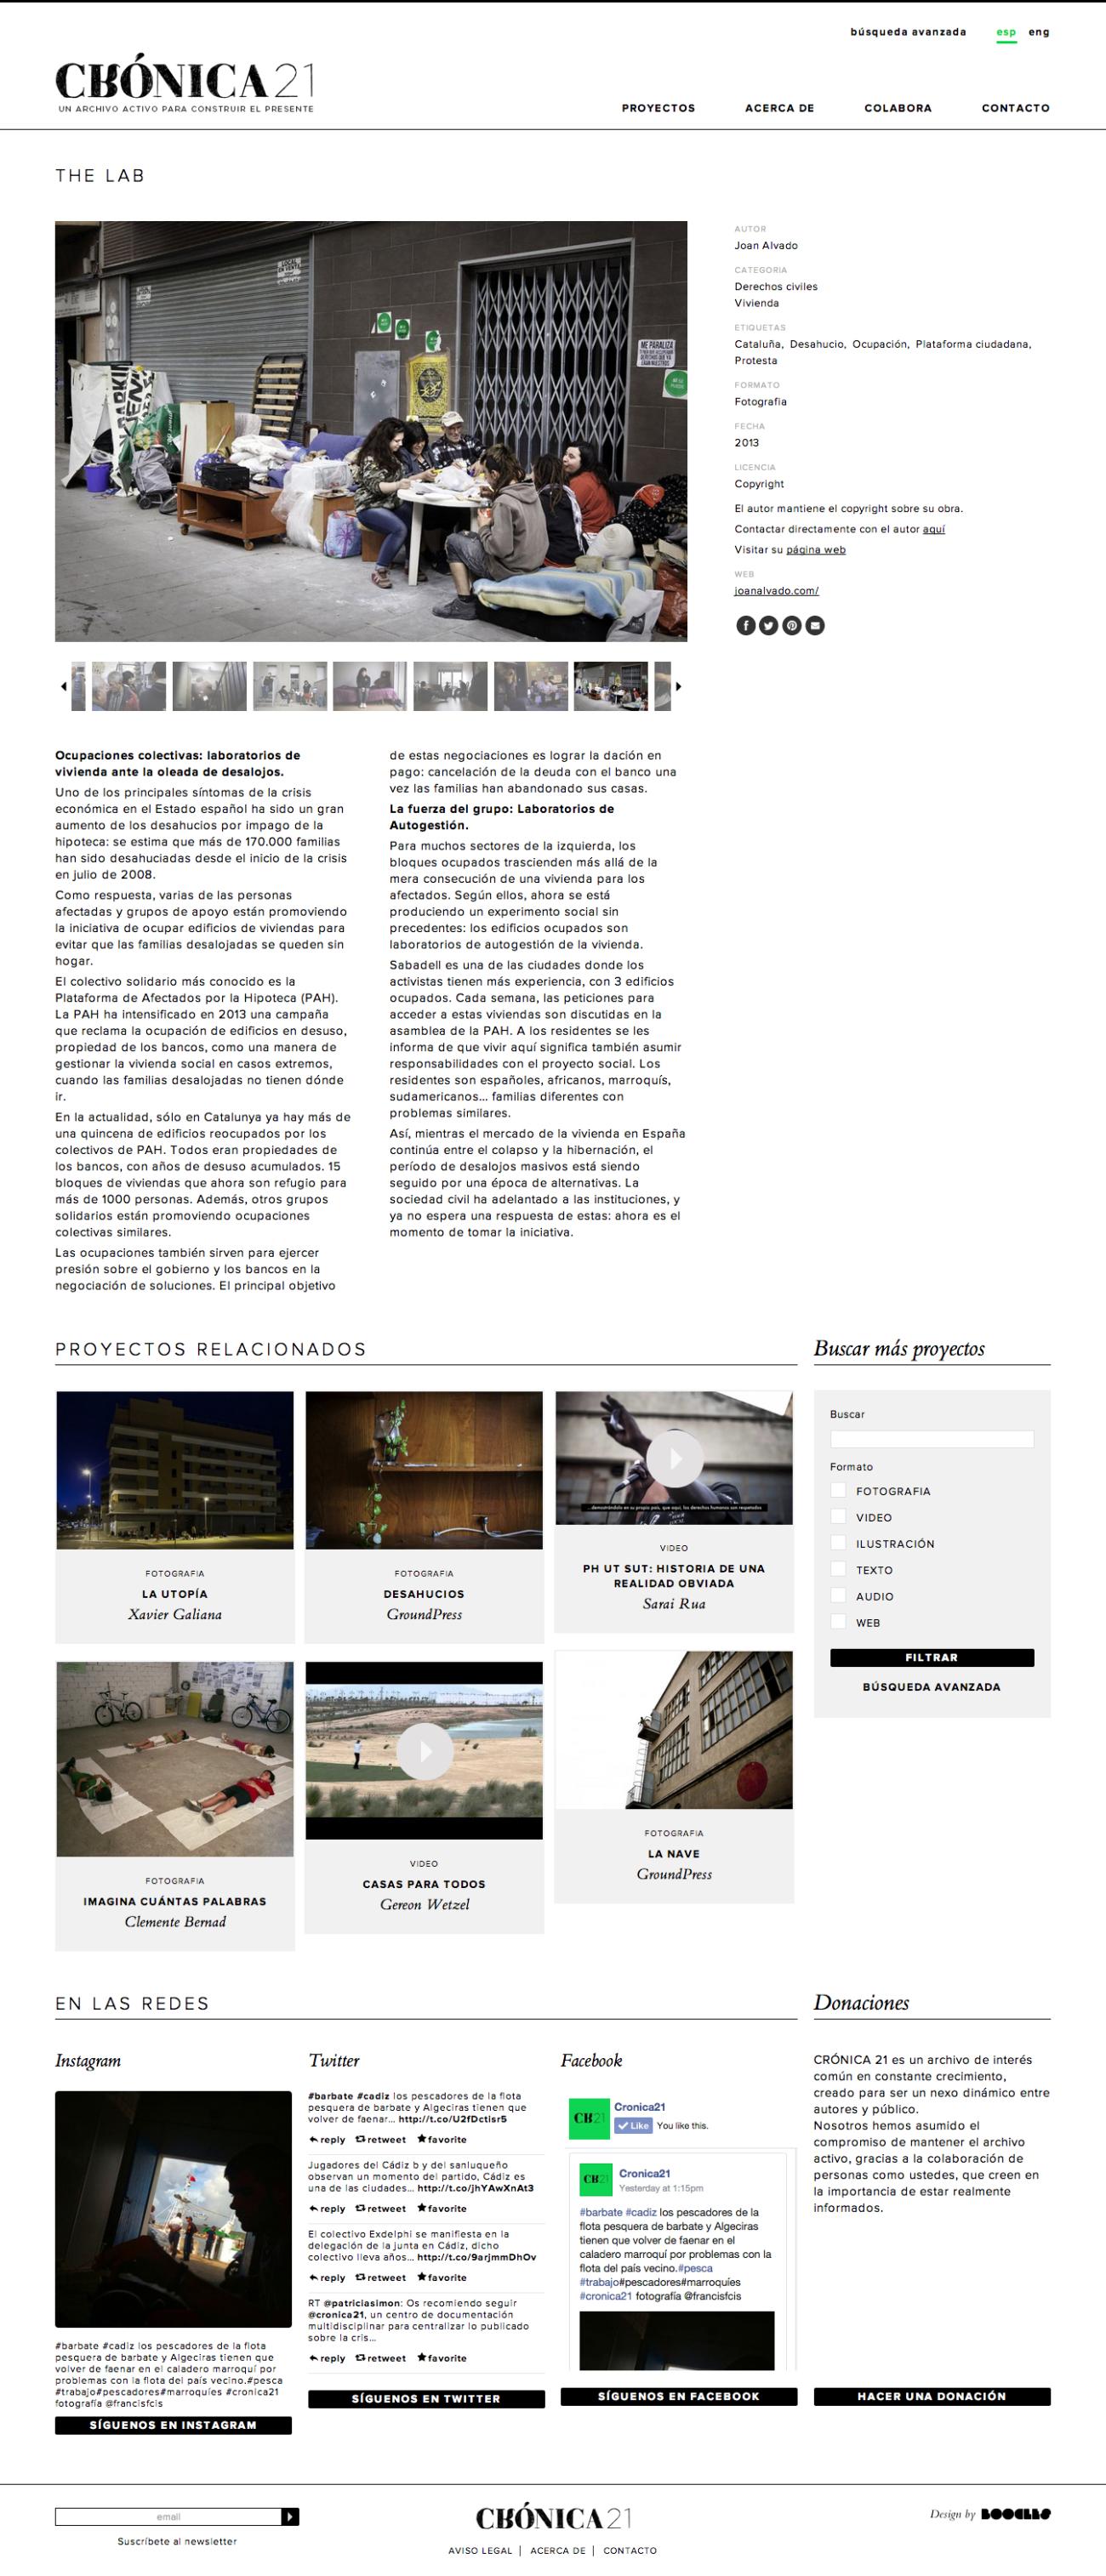 Web Crónica 21